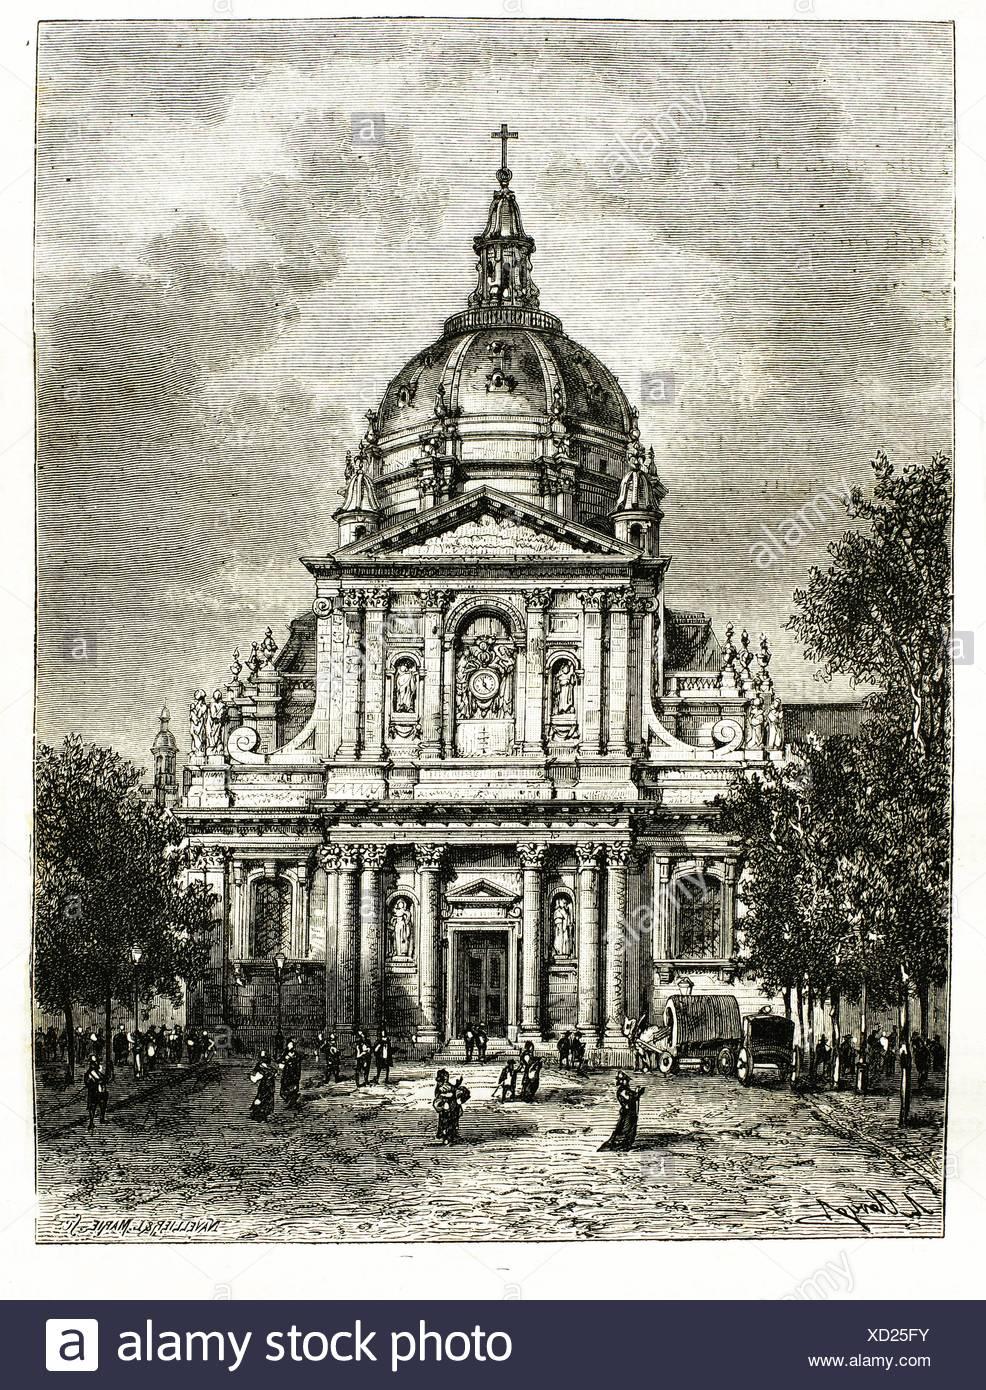 Sorbonne University at Paris (19th century), France - Stock Image